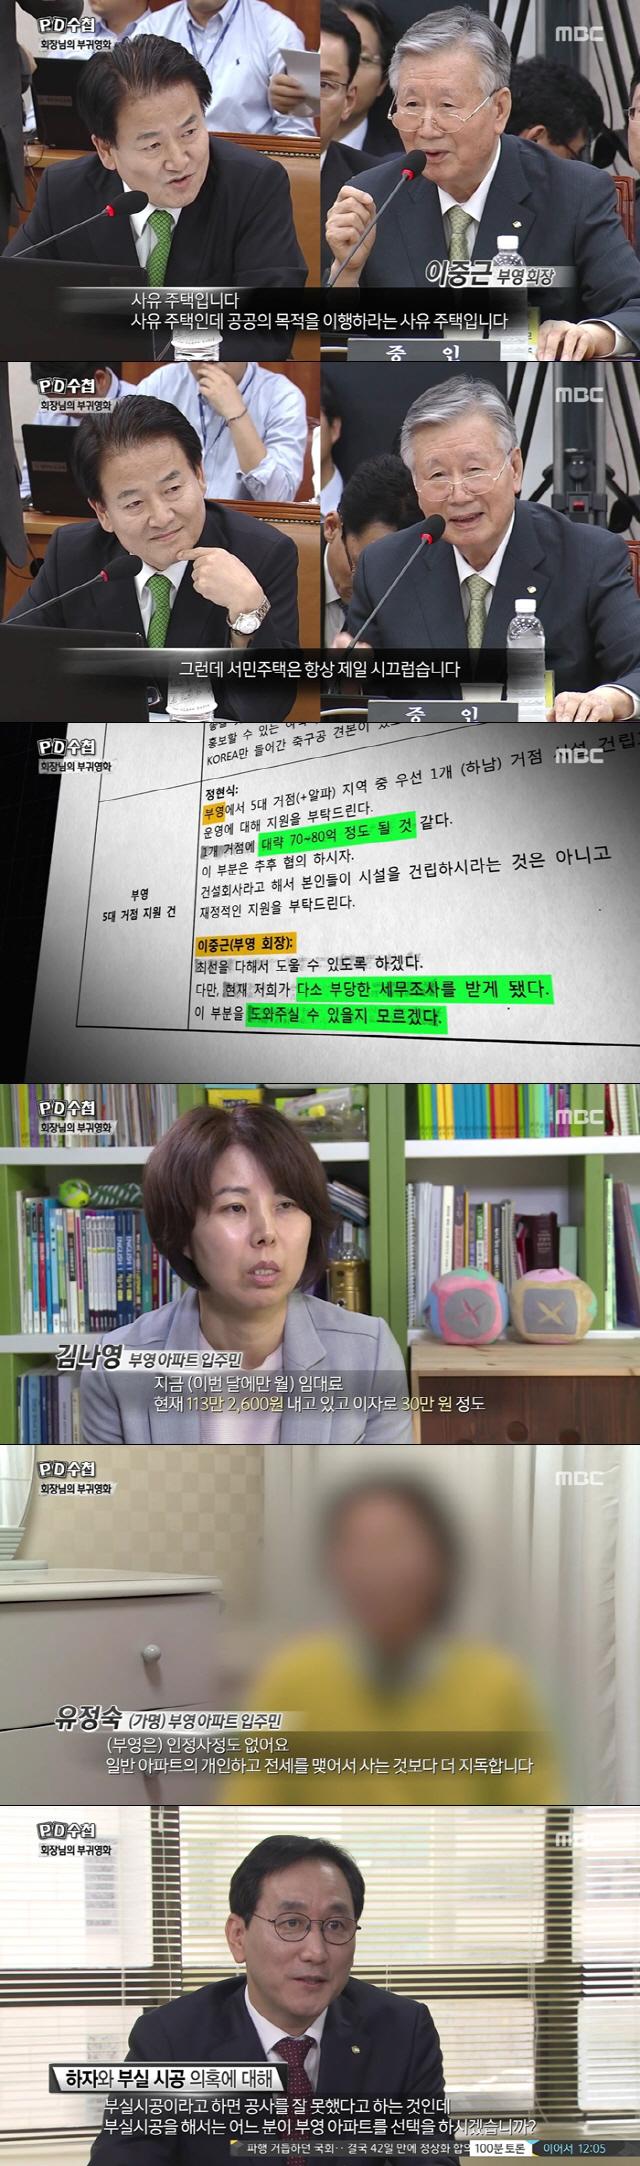 'PD수첩' 부영 이중근 회장 '서민 아파트 항상 시끄러워' 발언 재조명